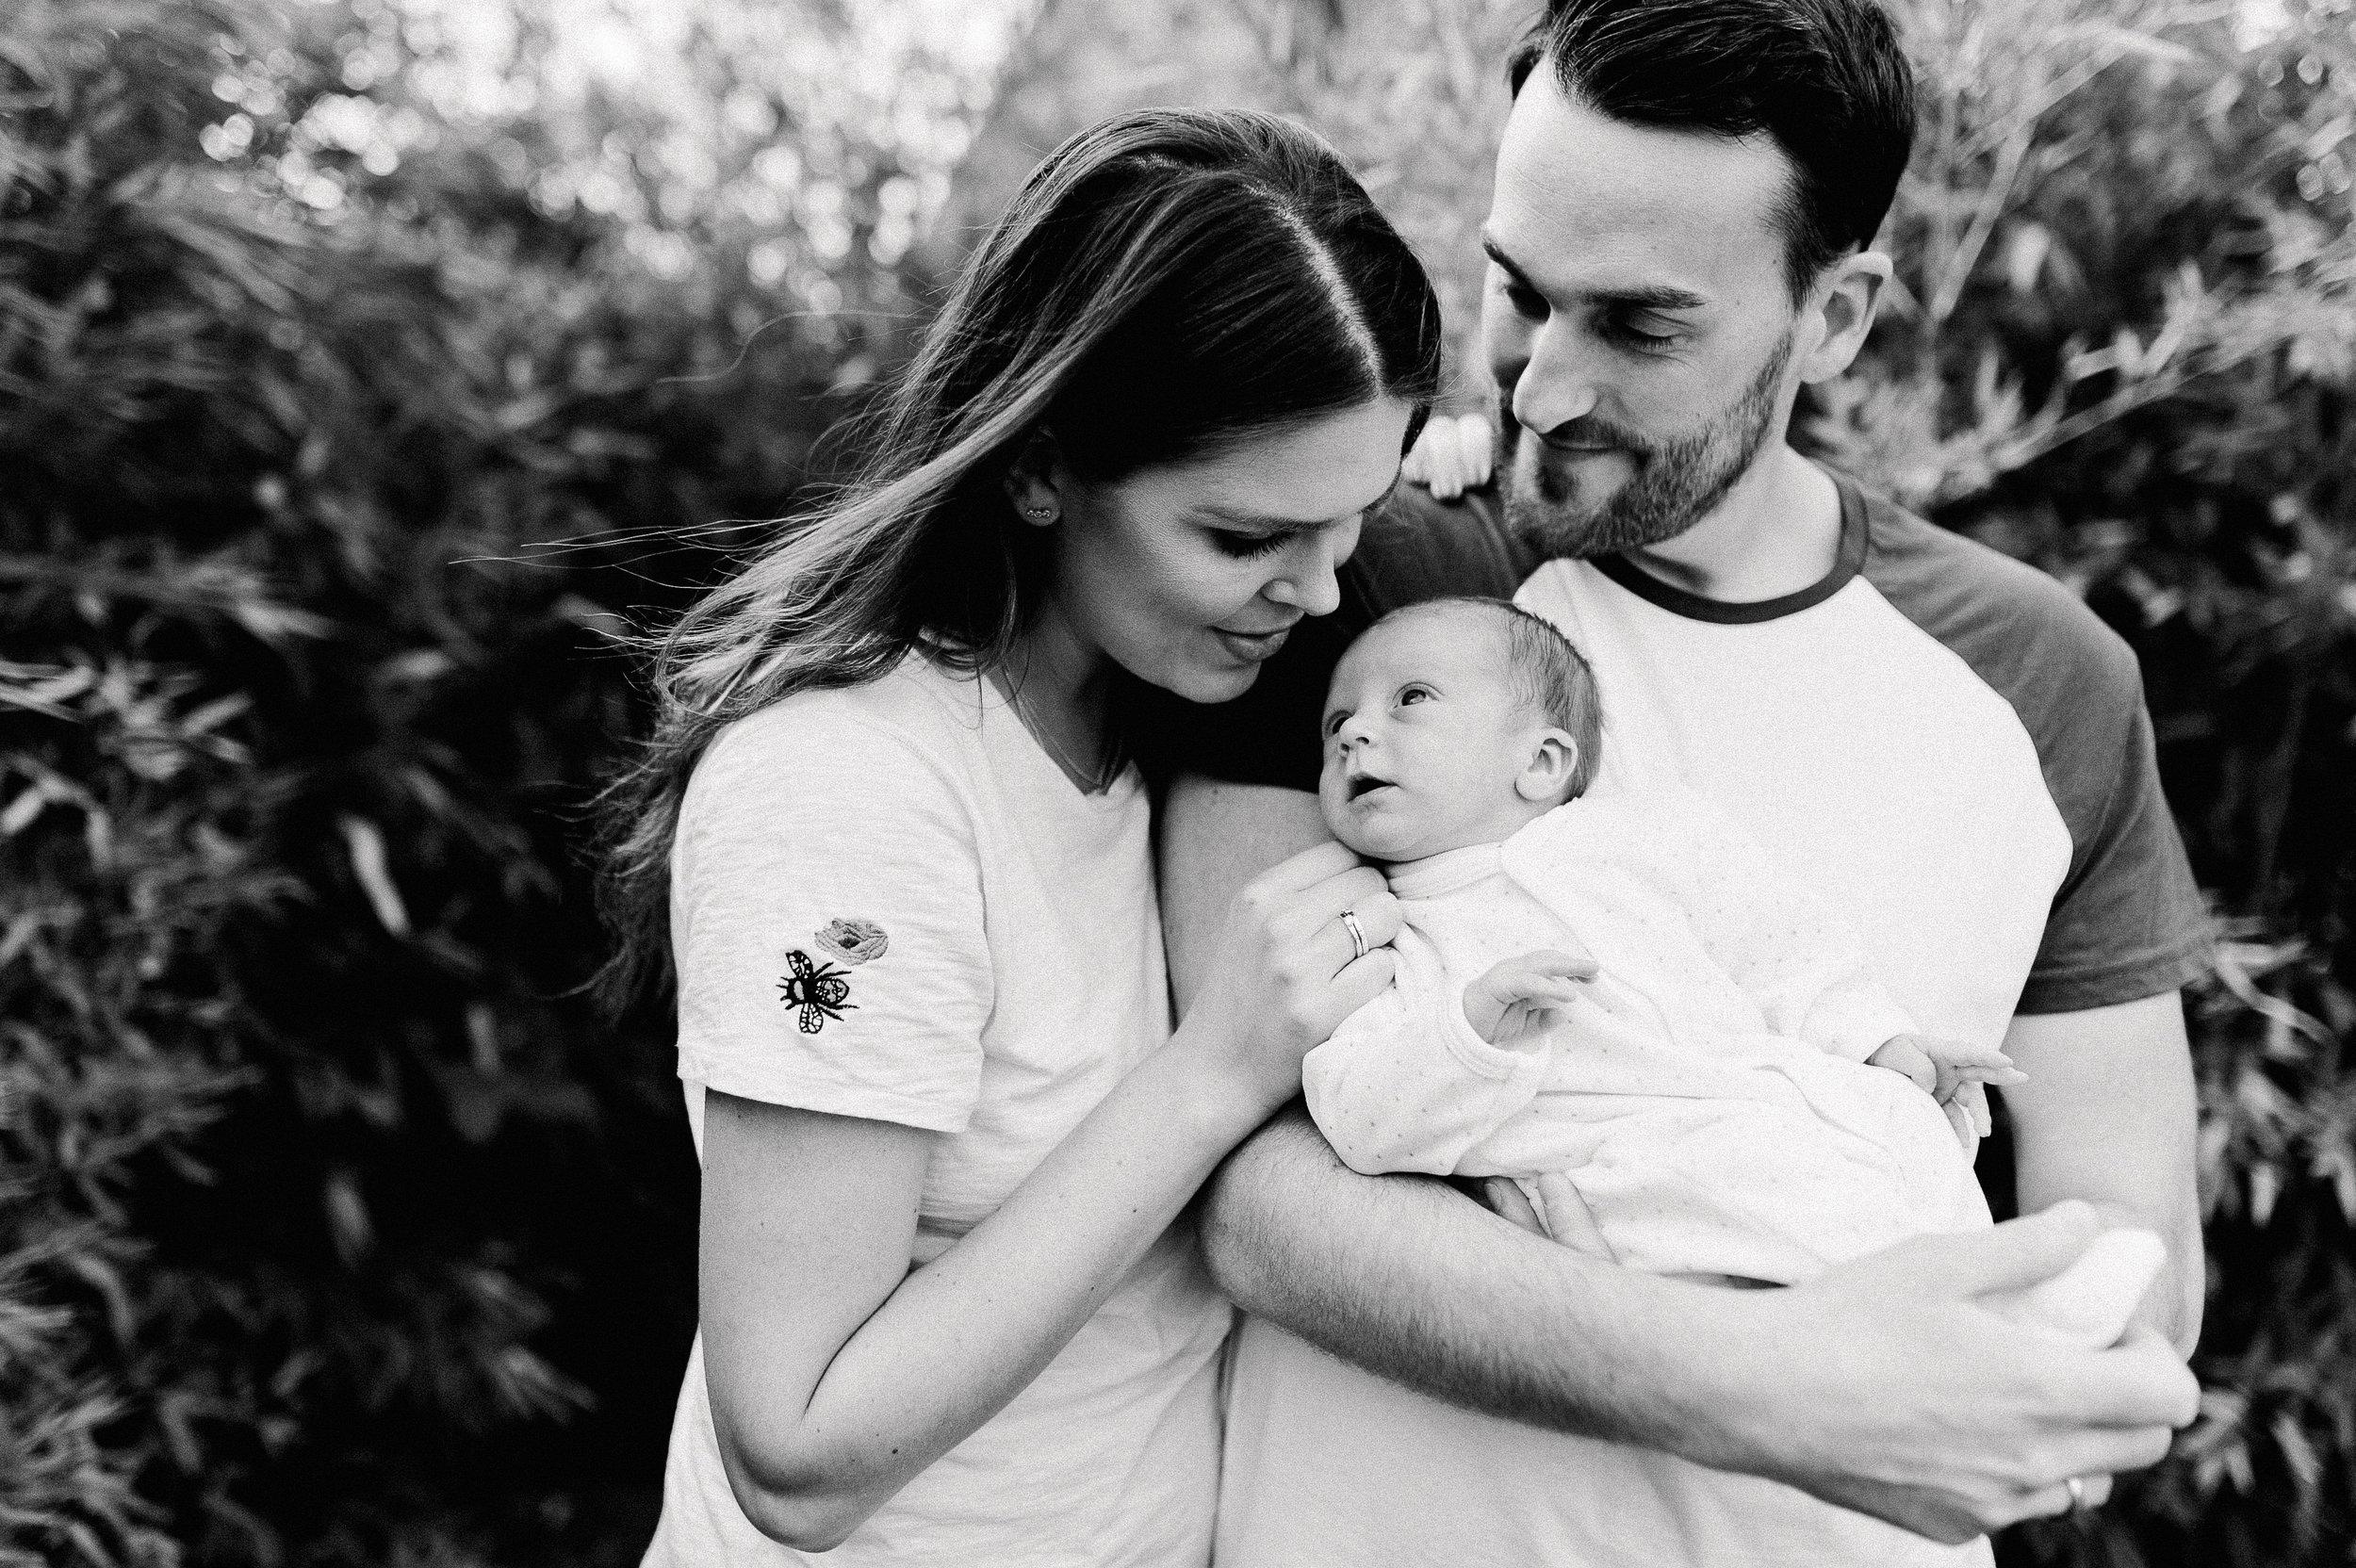 Anna-Hari-Photography-Familienshooting-Neugeborenenshooting-Mannheim-Heidelberg31.jpg